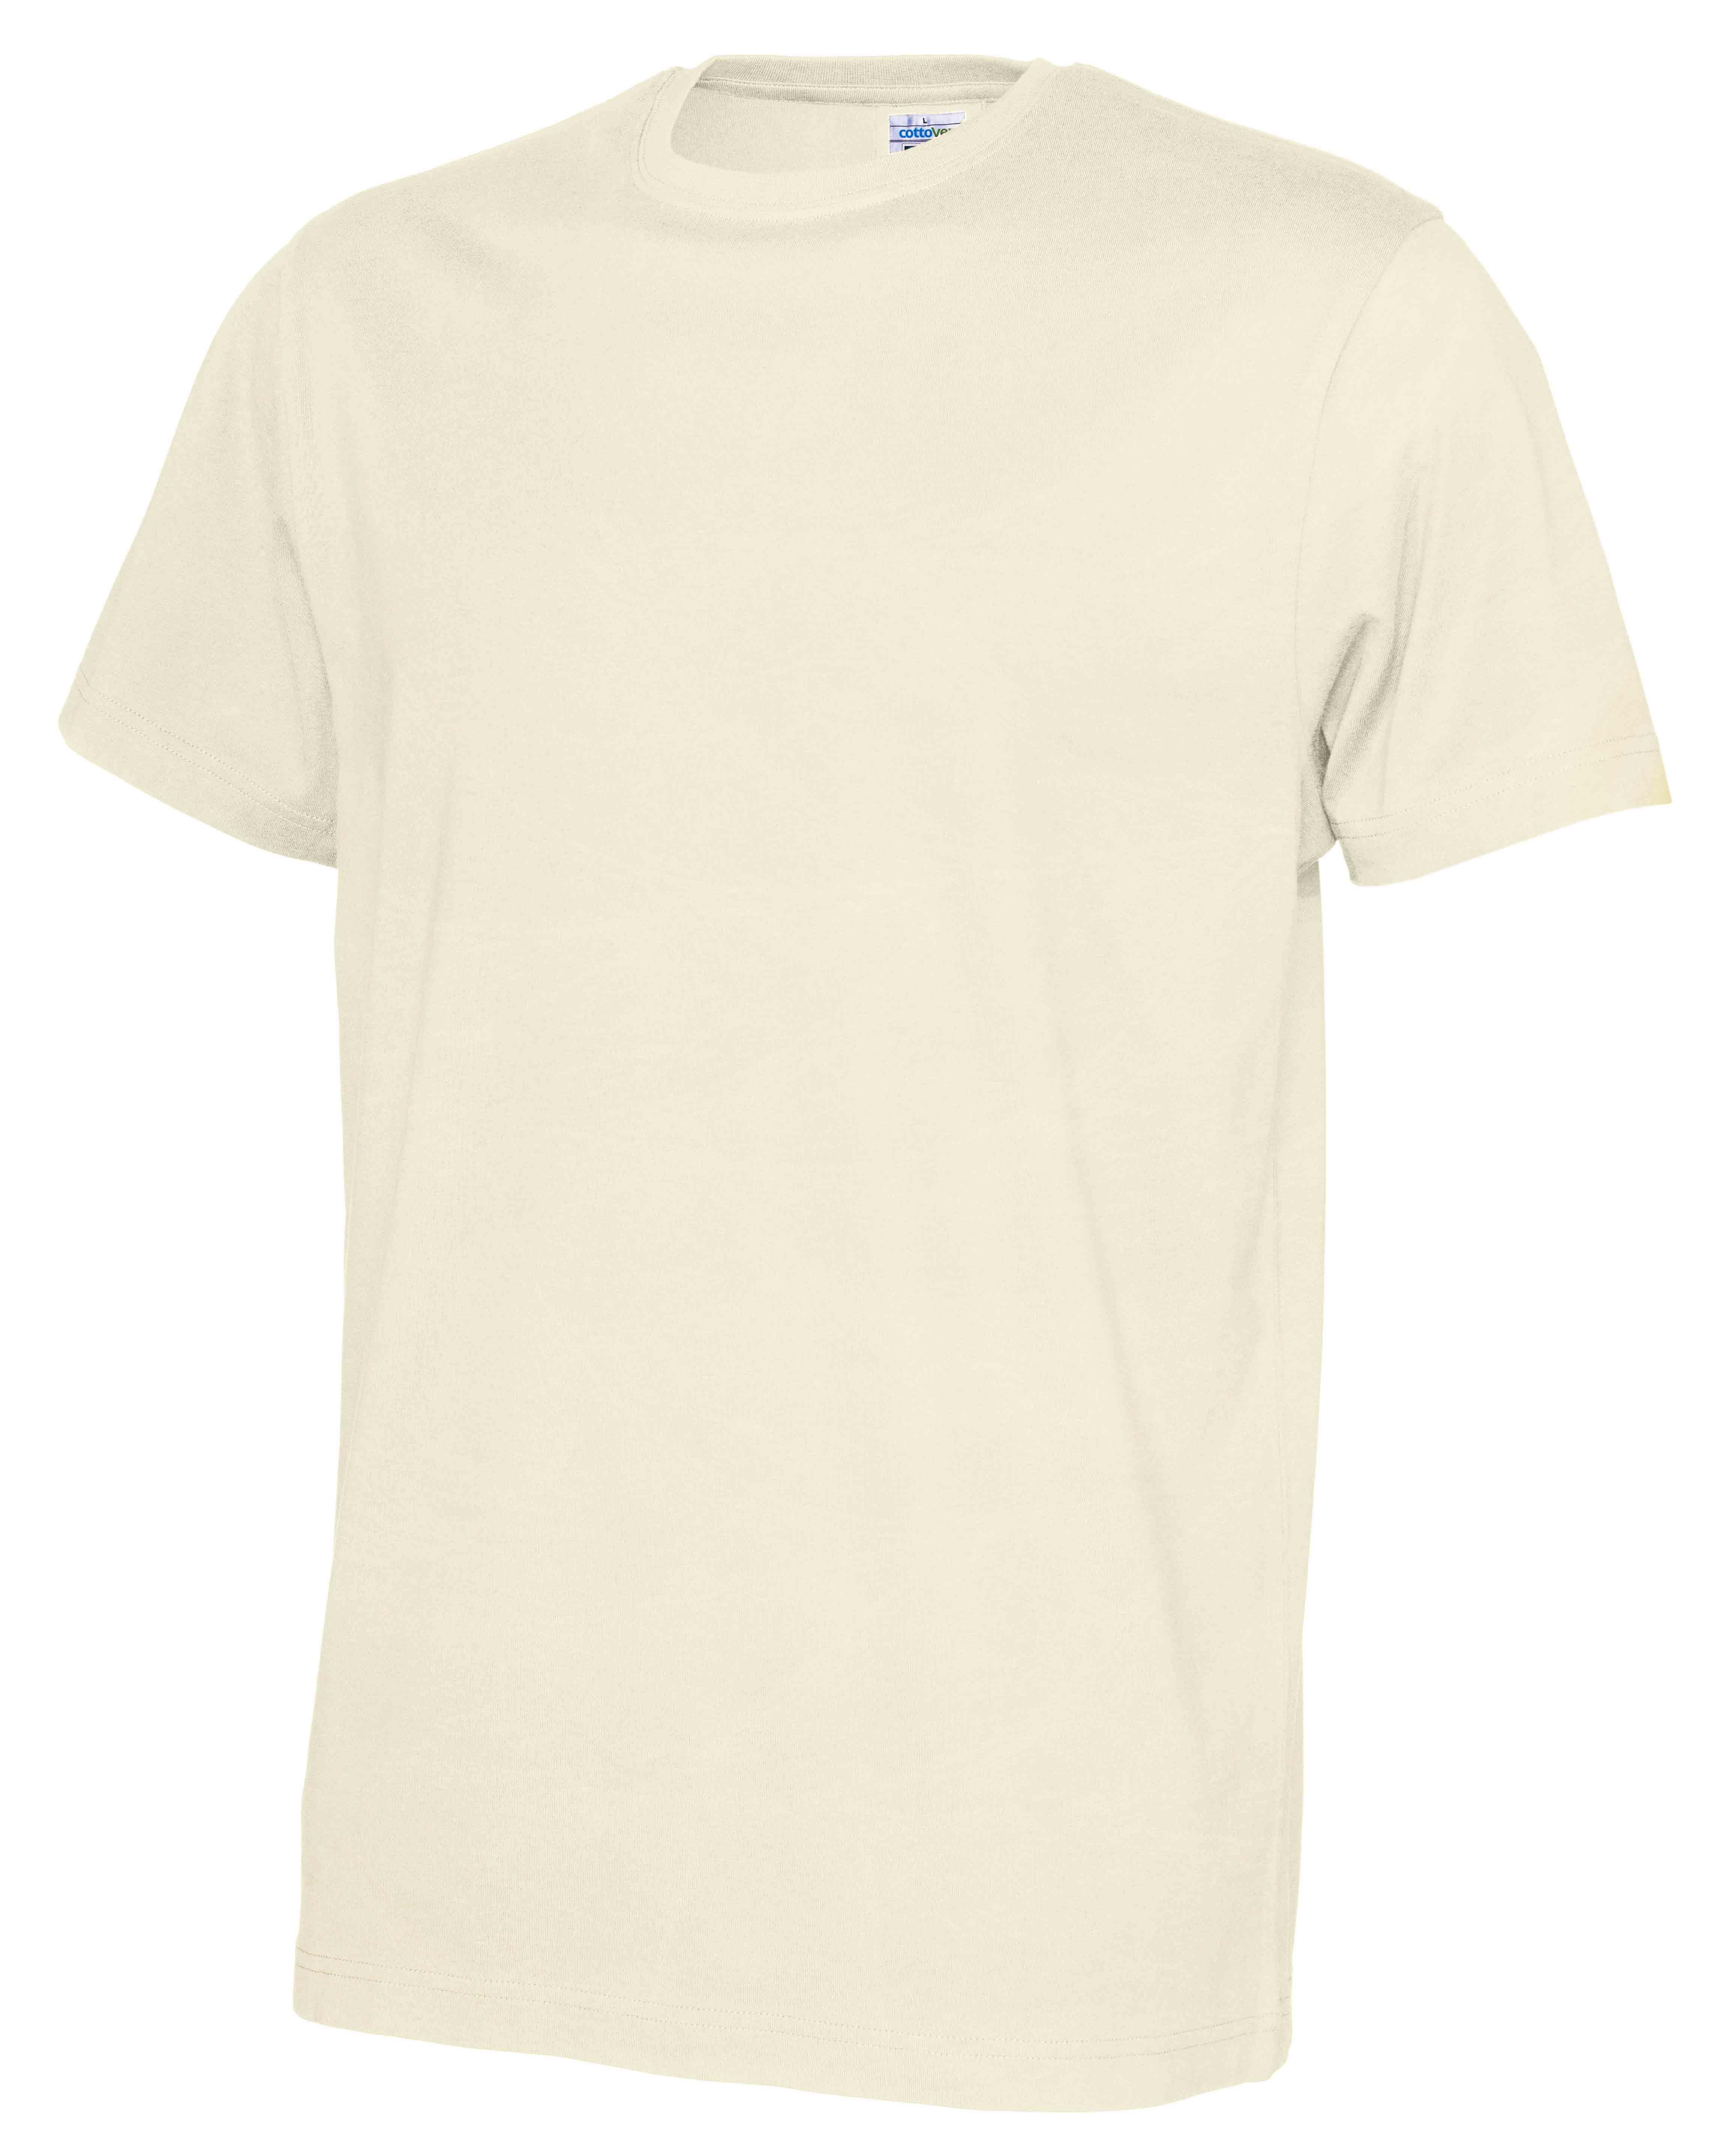 T-shirt Man